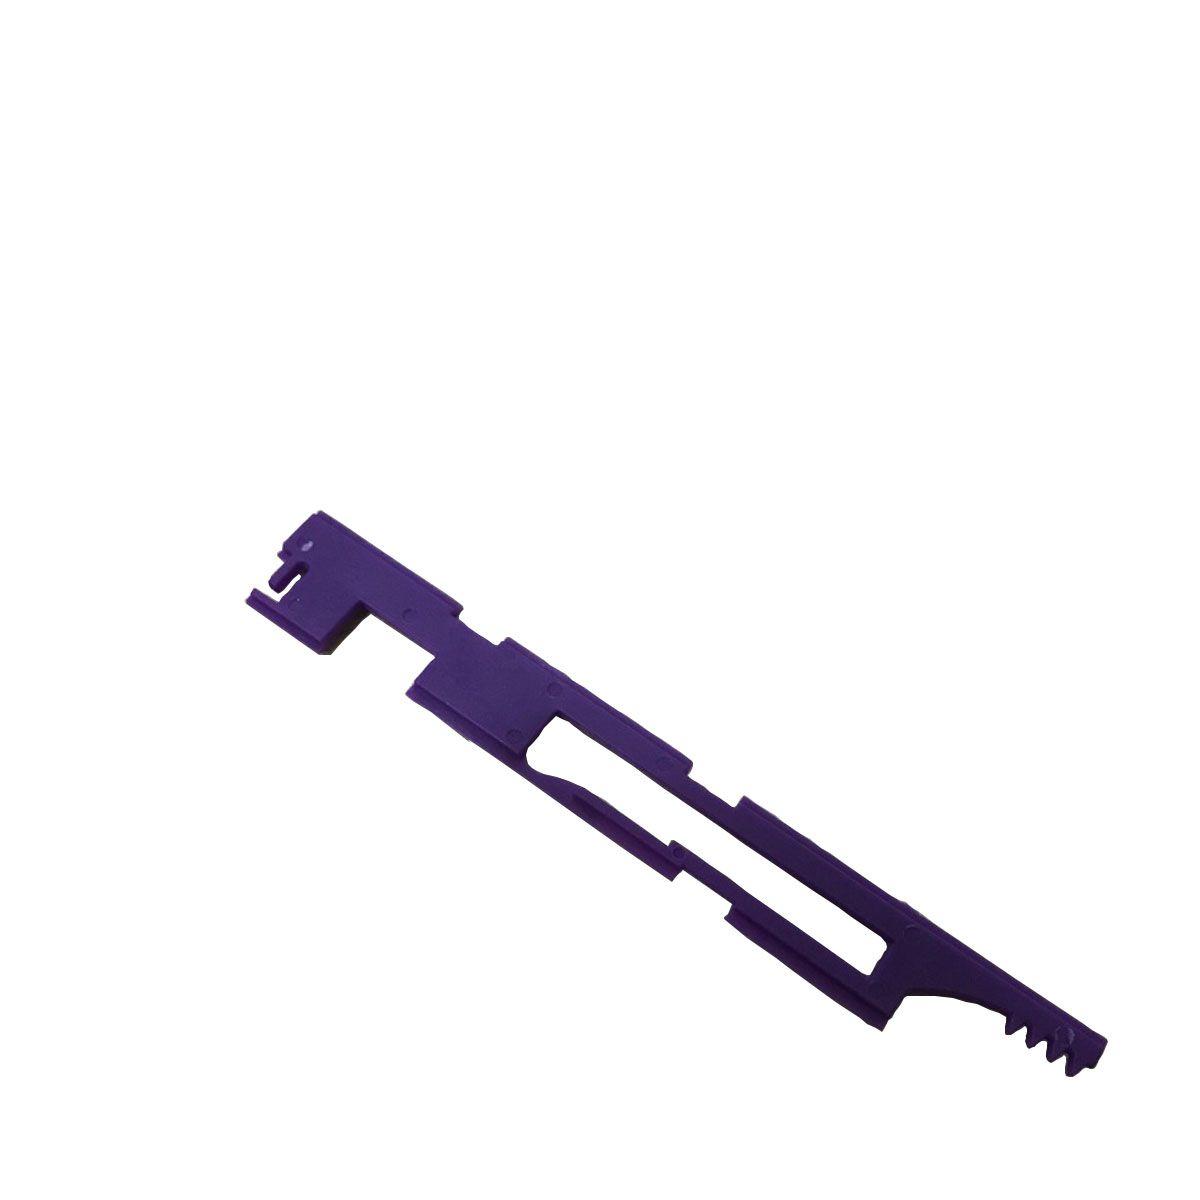 Placa Seletora SHS Gearbox Versão 3 (V3)